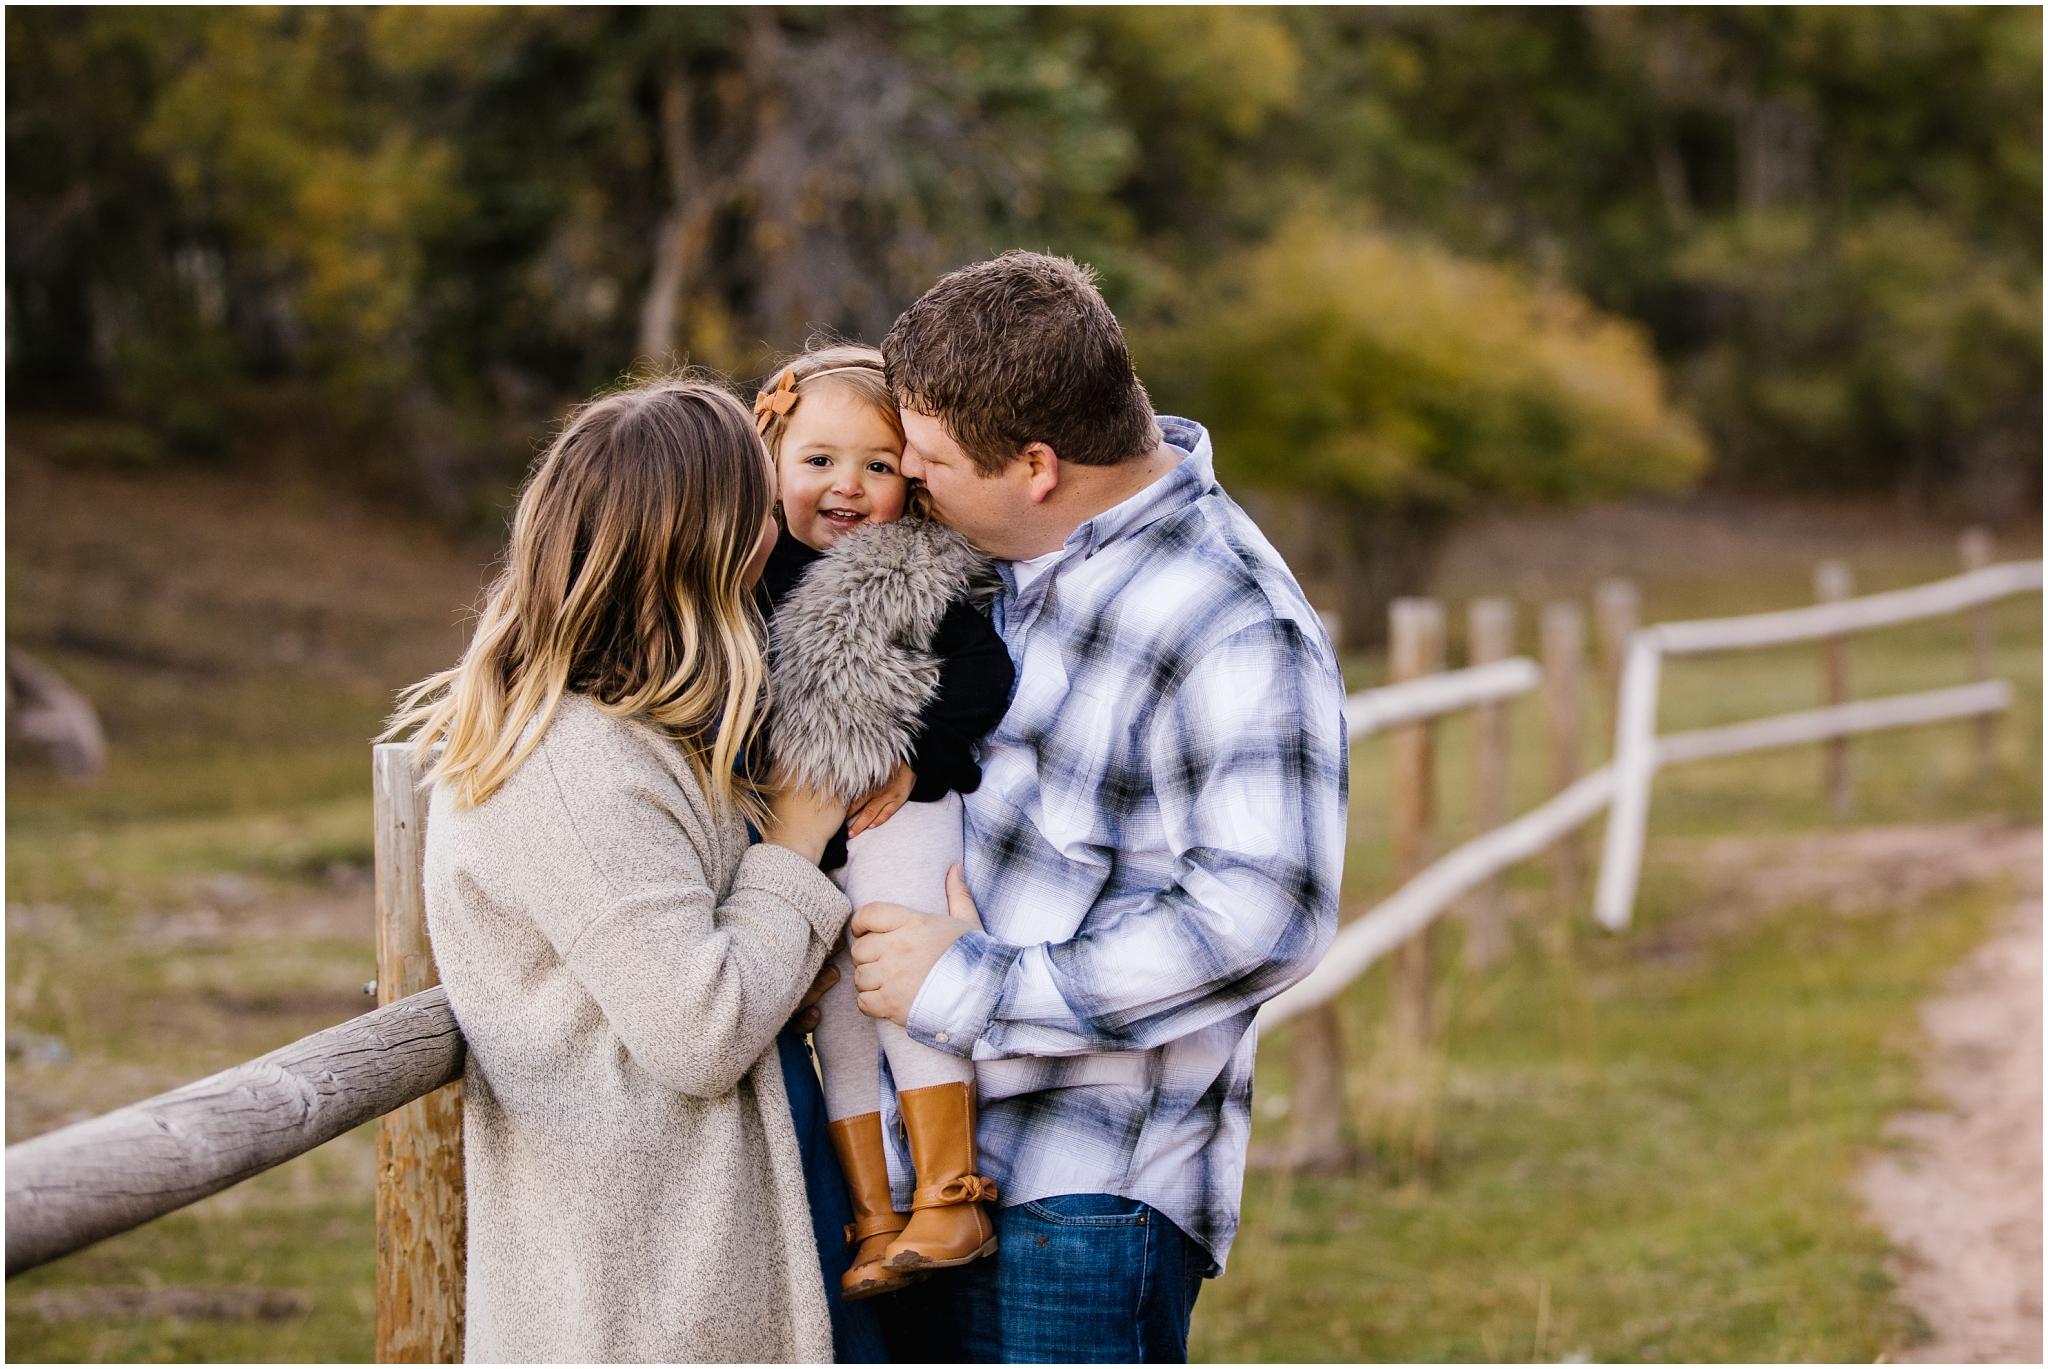 Frandsen-58_Lizzie-B-Imagery-Utah-Family-Photographer-Utah-County-Central-Utah-Park-City-Salt-Lake-City.jpg